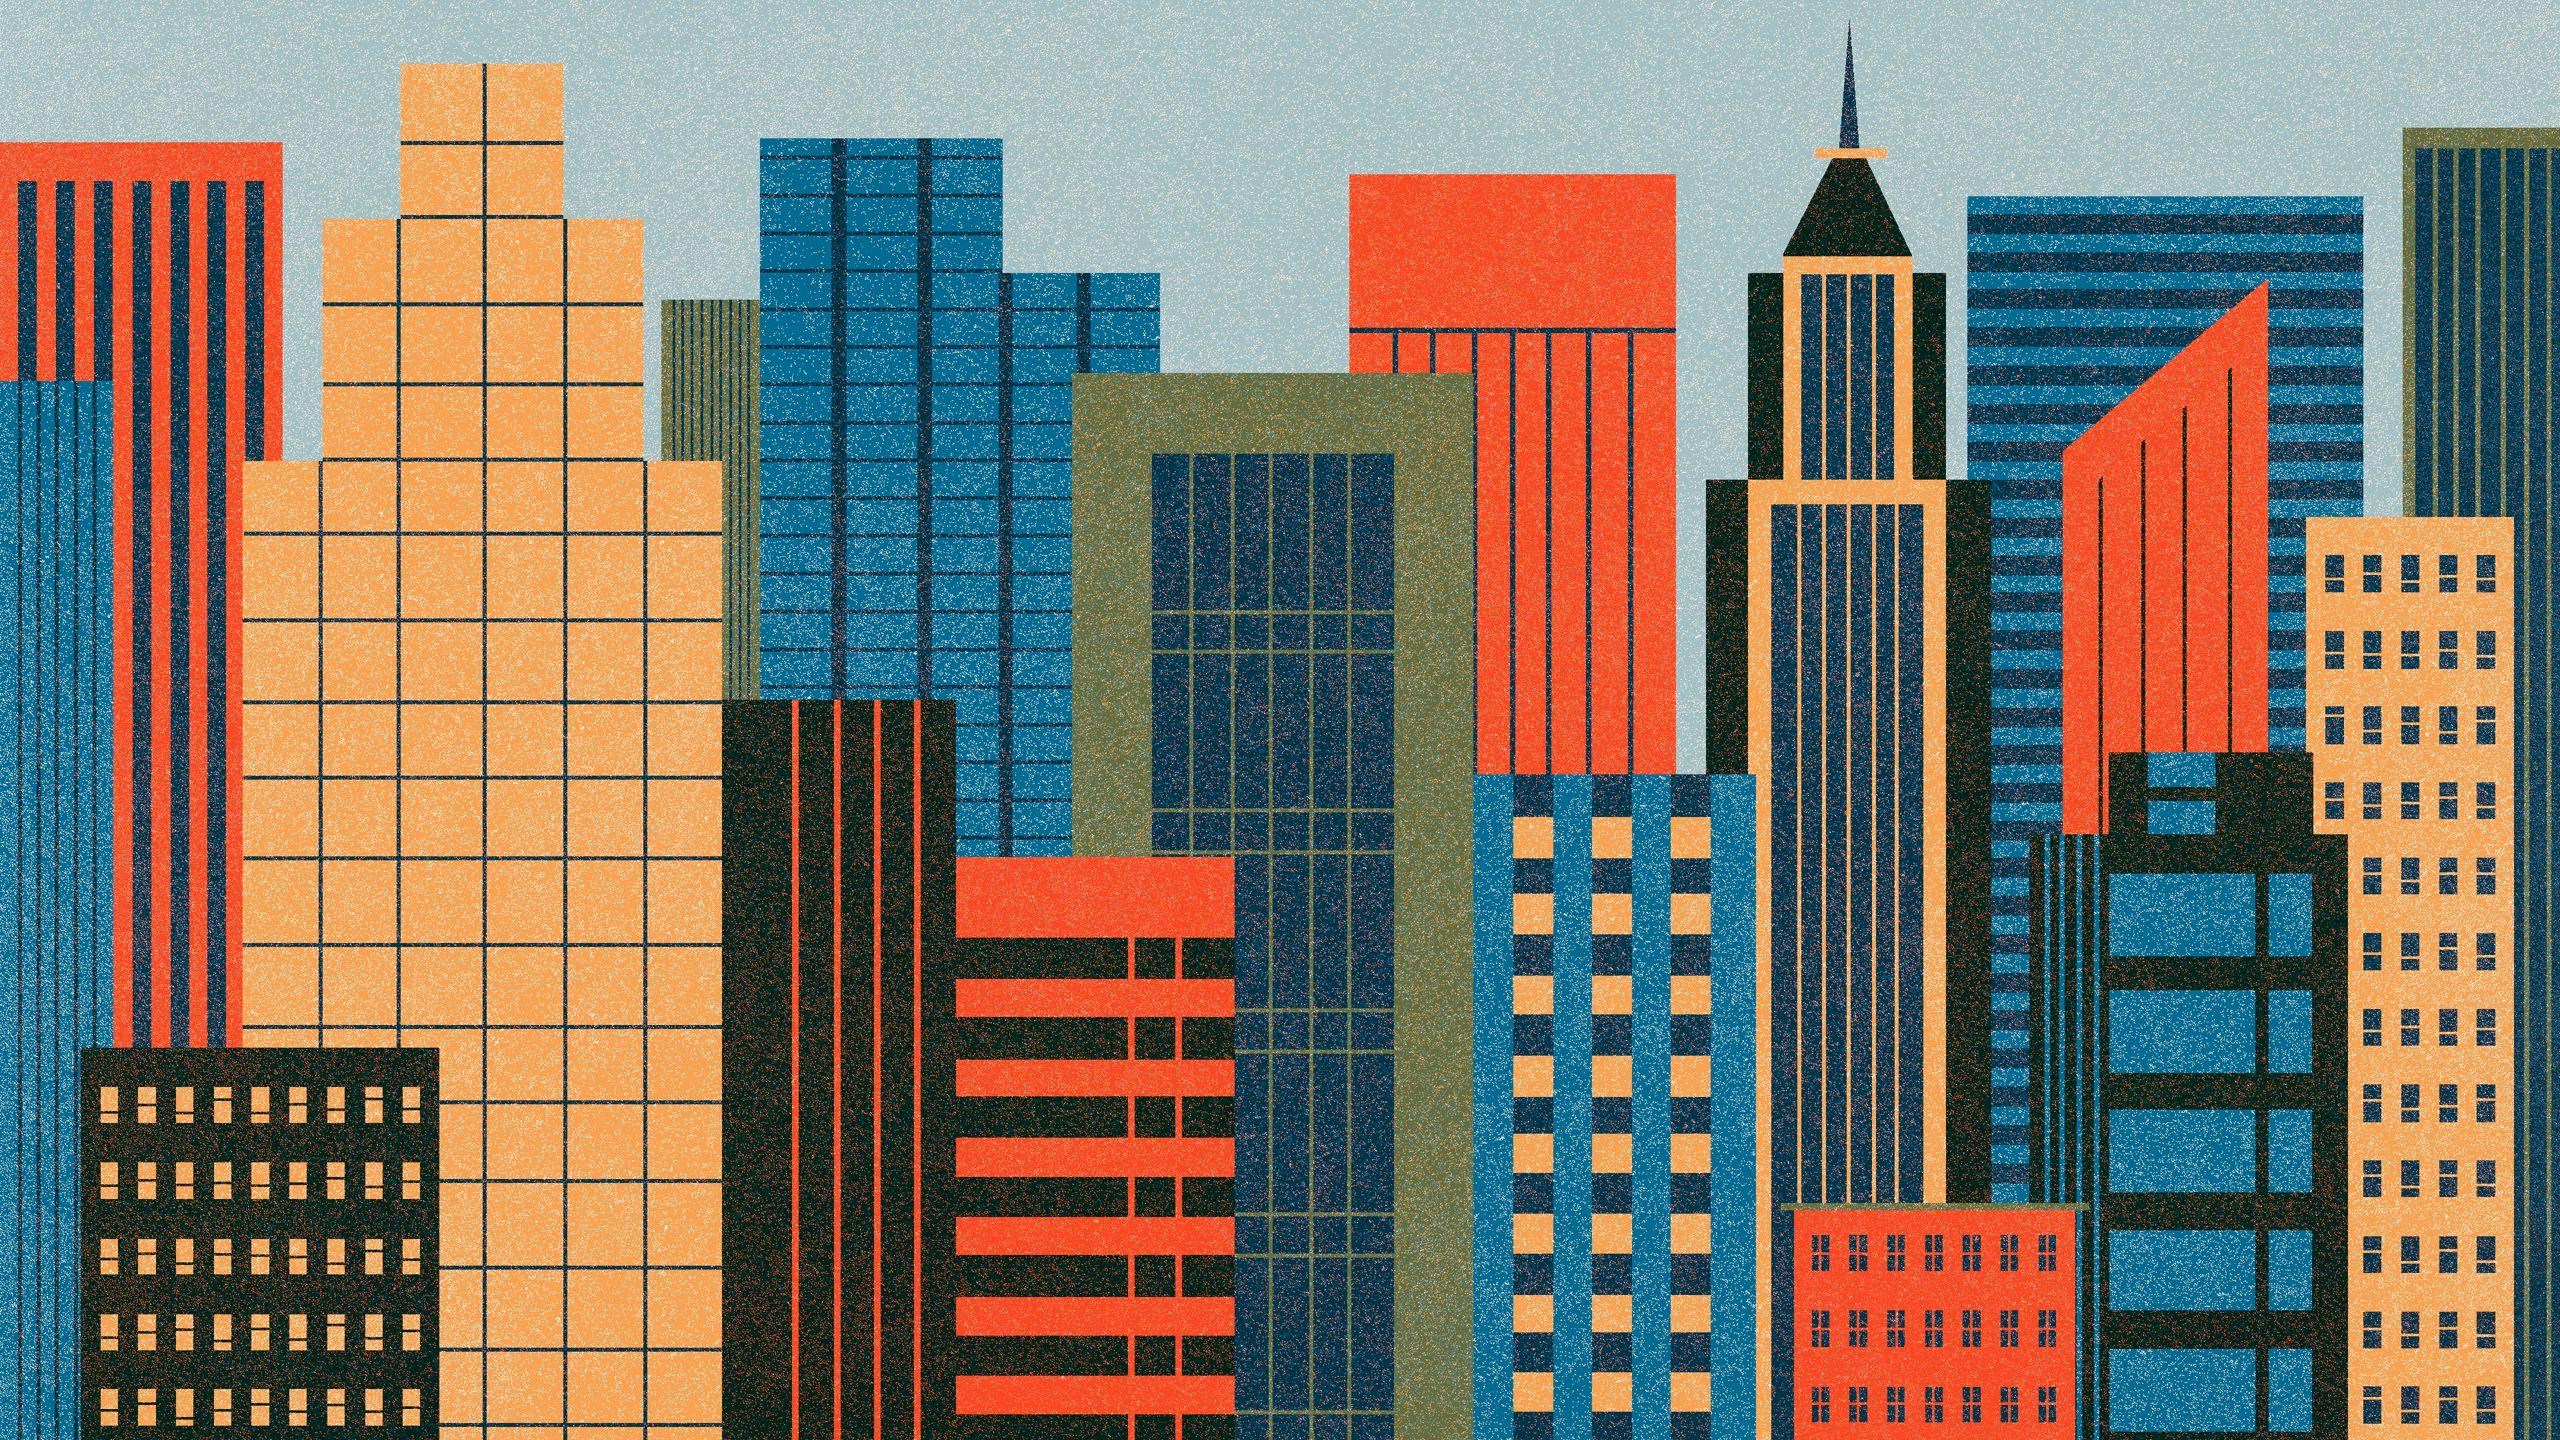 The Desktop Wallpaper Project Featuring Ben Newman 2560x1440 Jpg 2 560 1 440 Pixels Building Illustration City Art Wallpaper Project